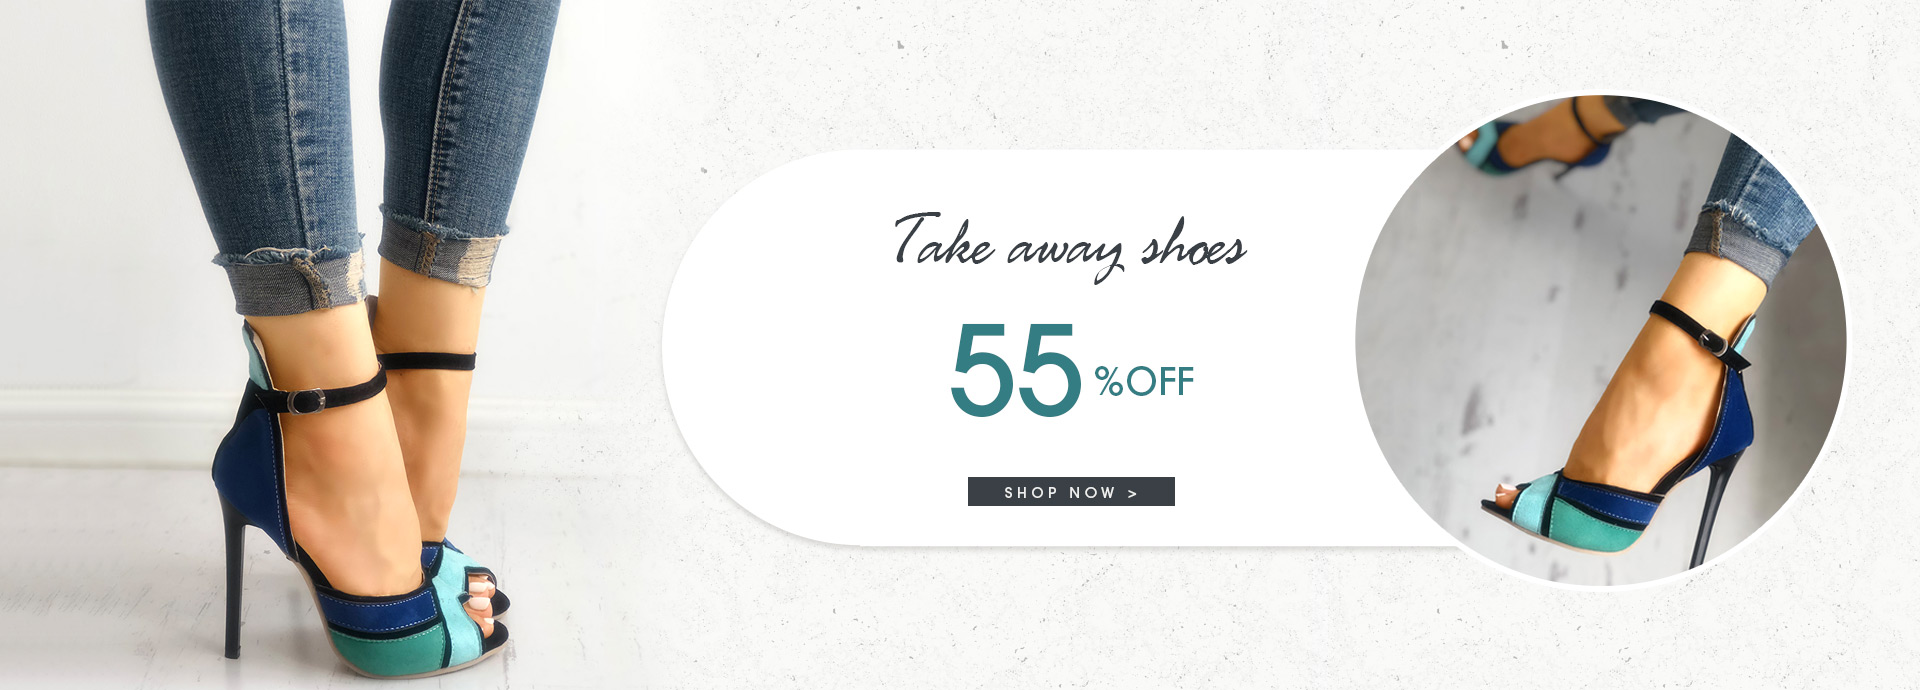 Take Away Shoes